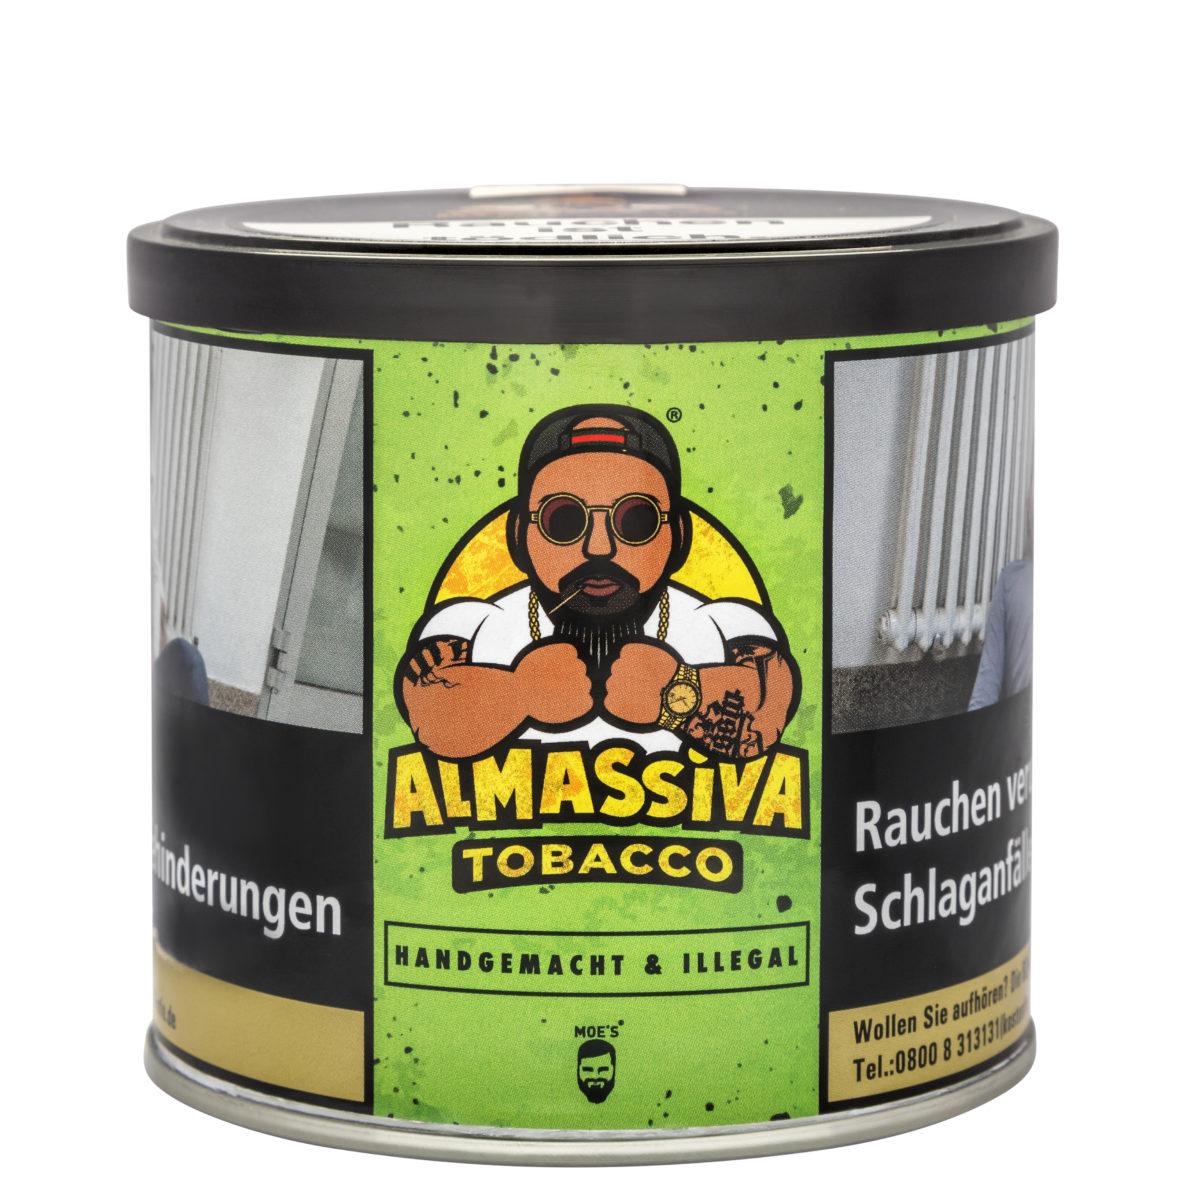 ALMASSIVA Tobacco - Handgemacht & Illegal